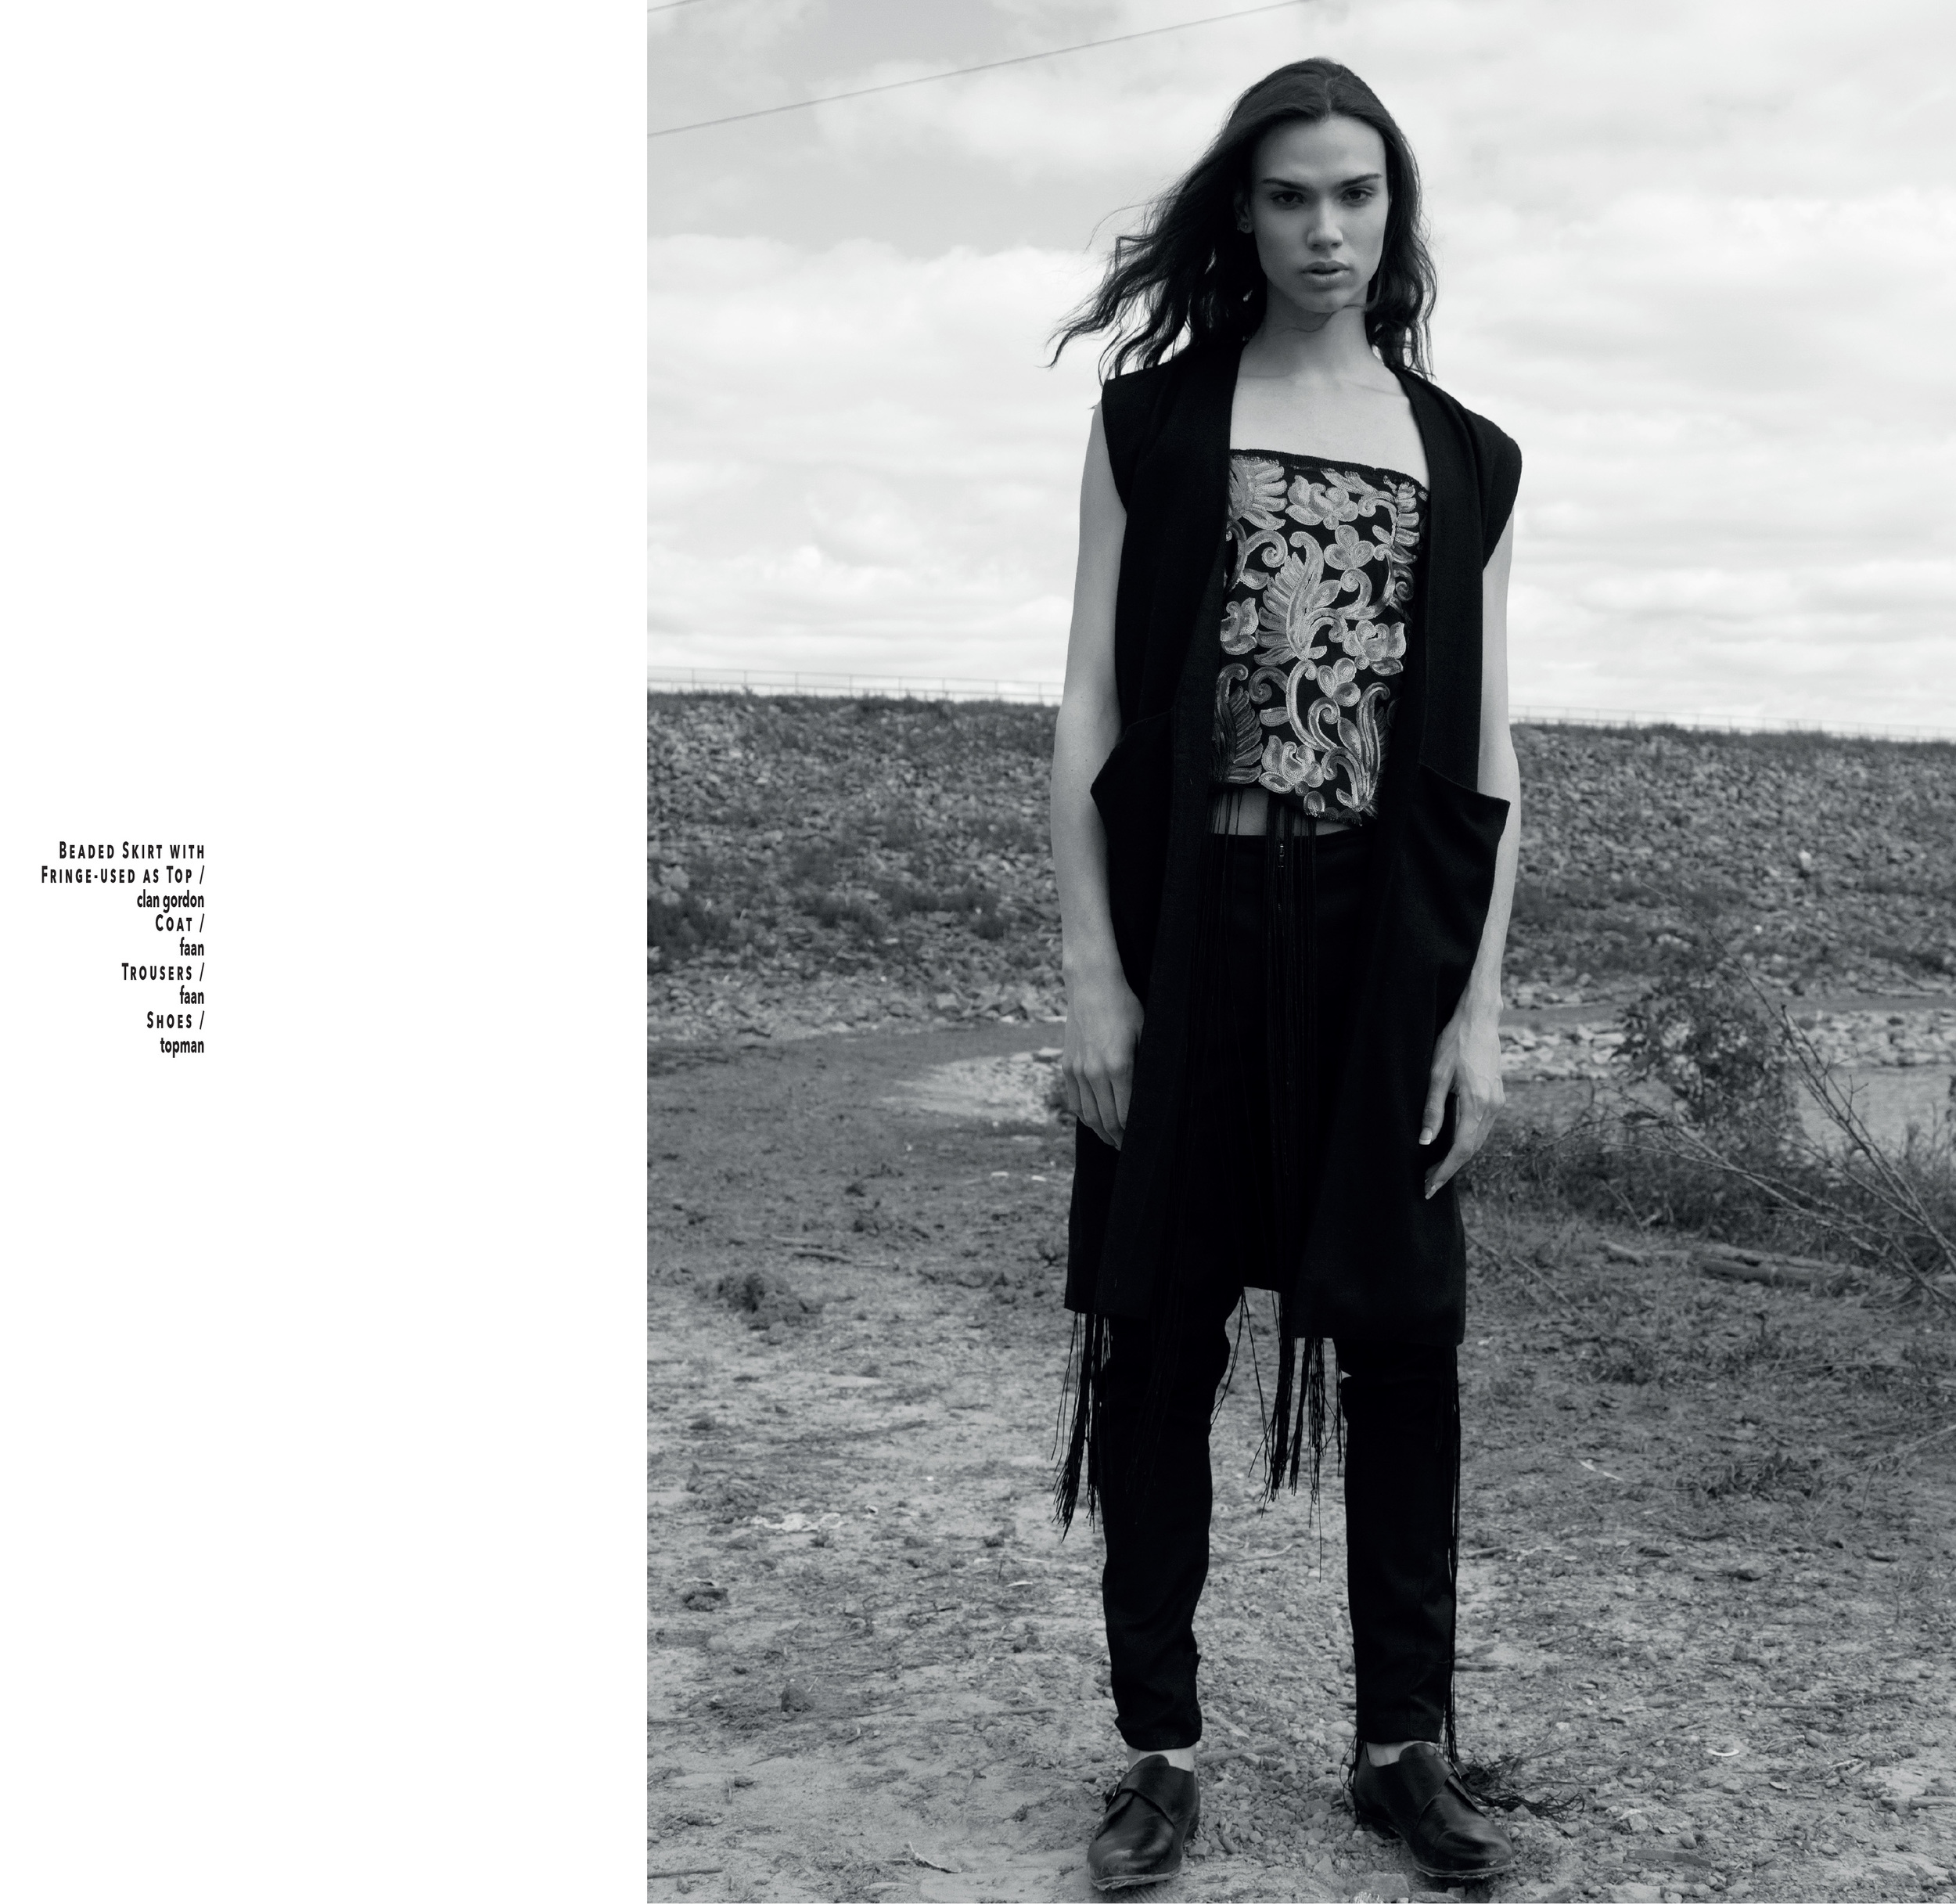 LE MILE Magazine ISSUE 11 Patrick Lacsina 4cropped.jpg